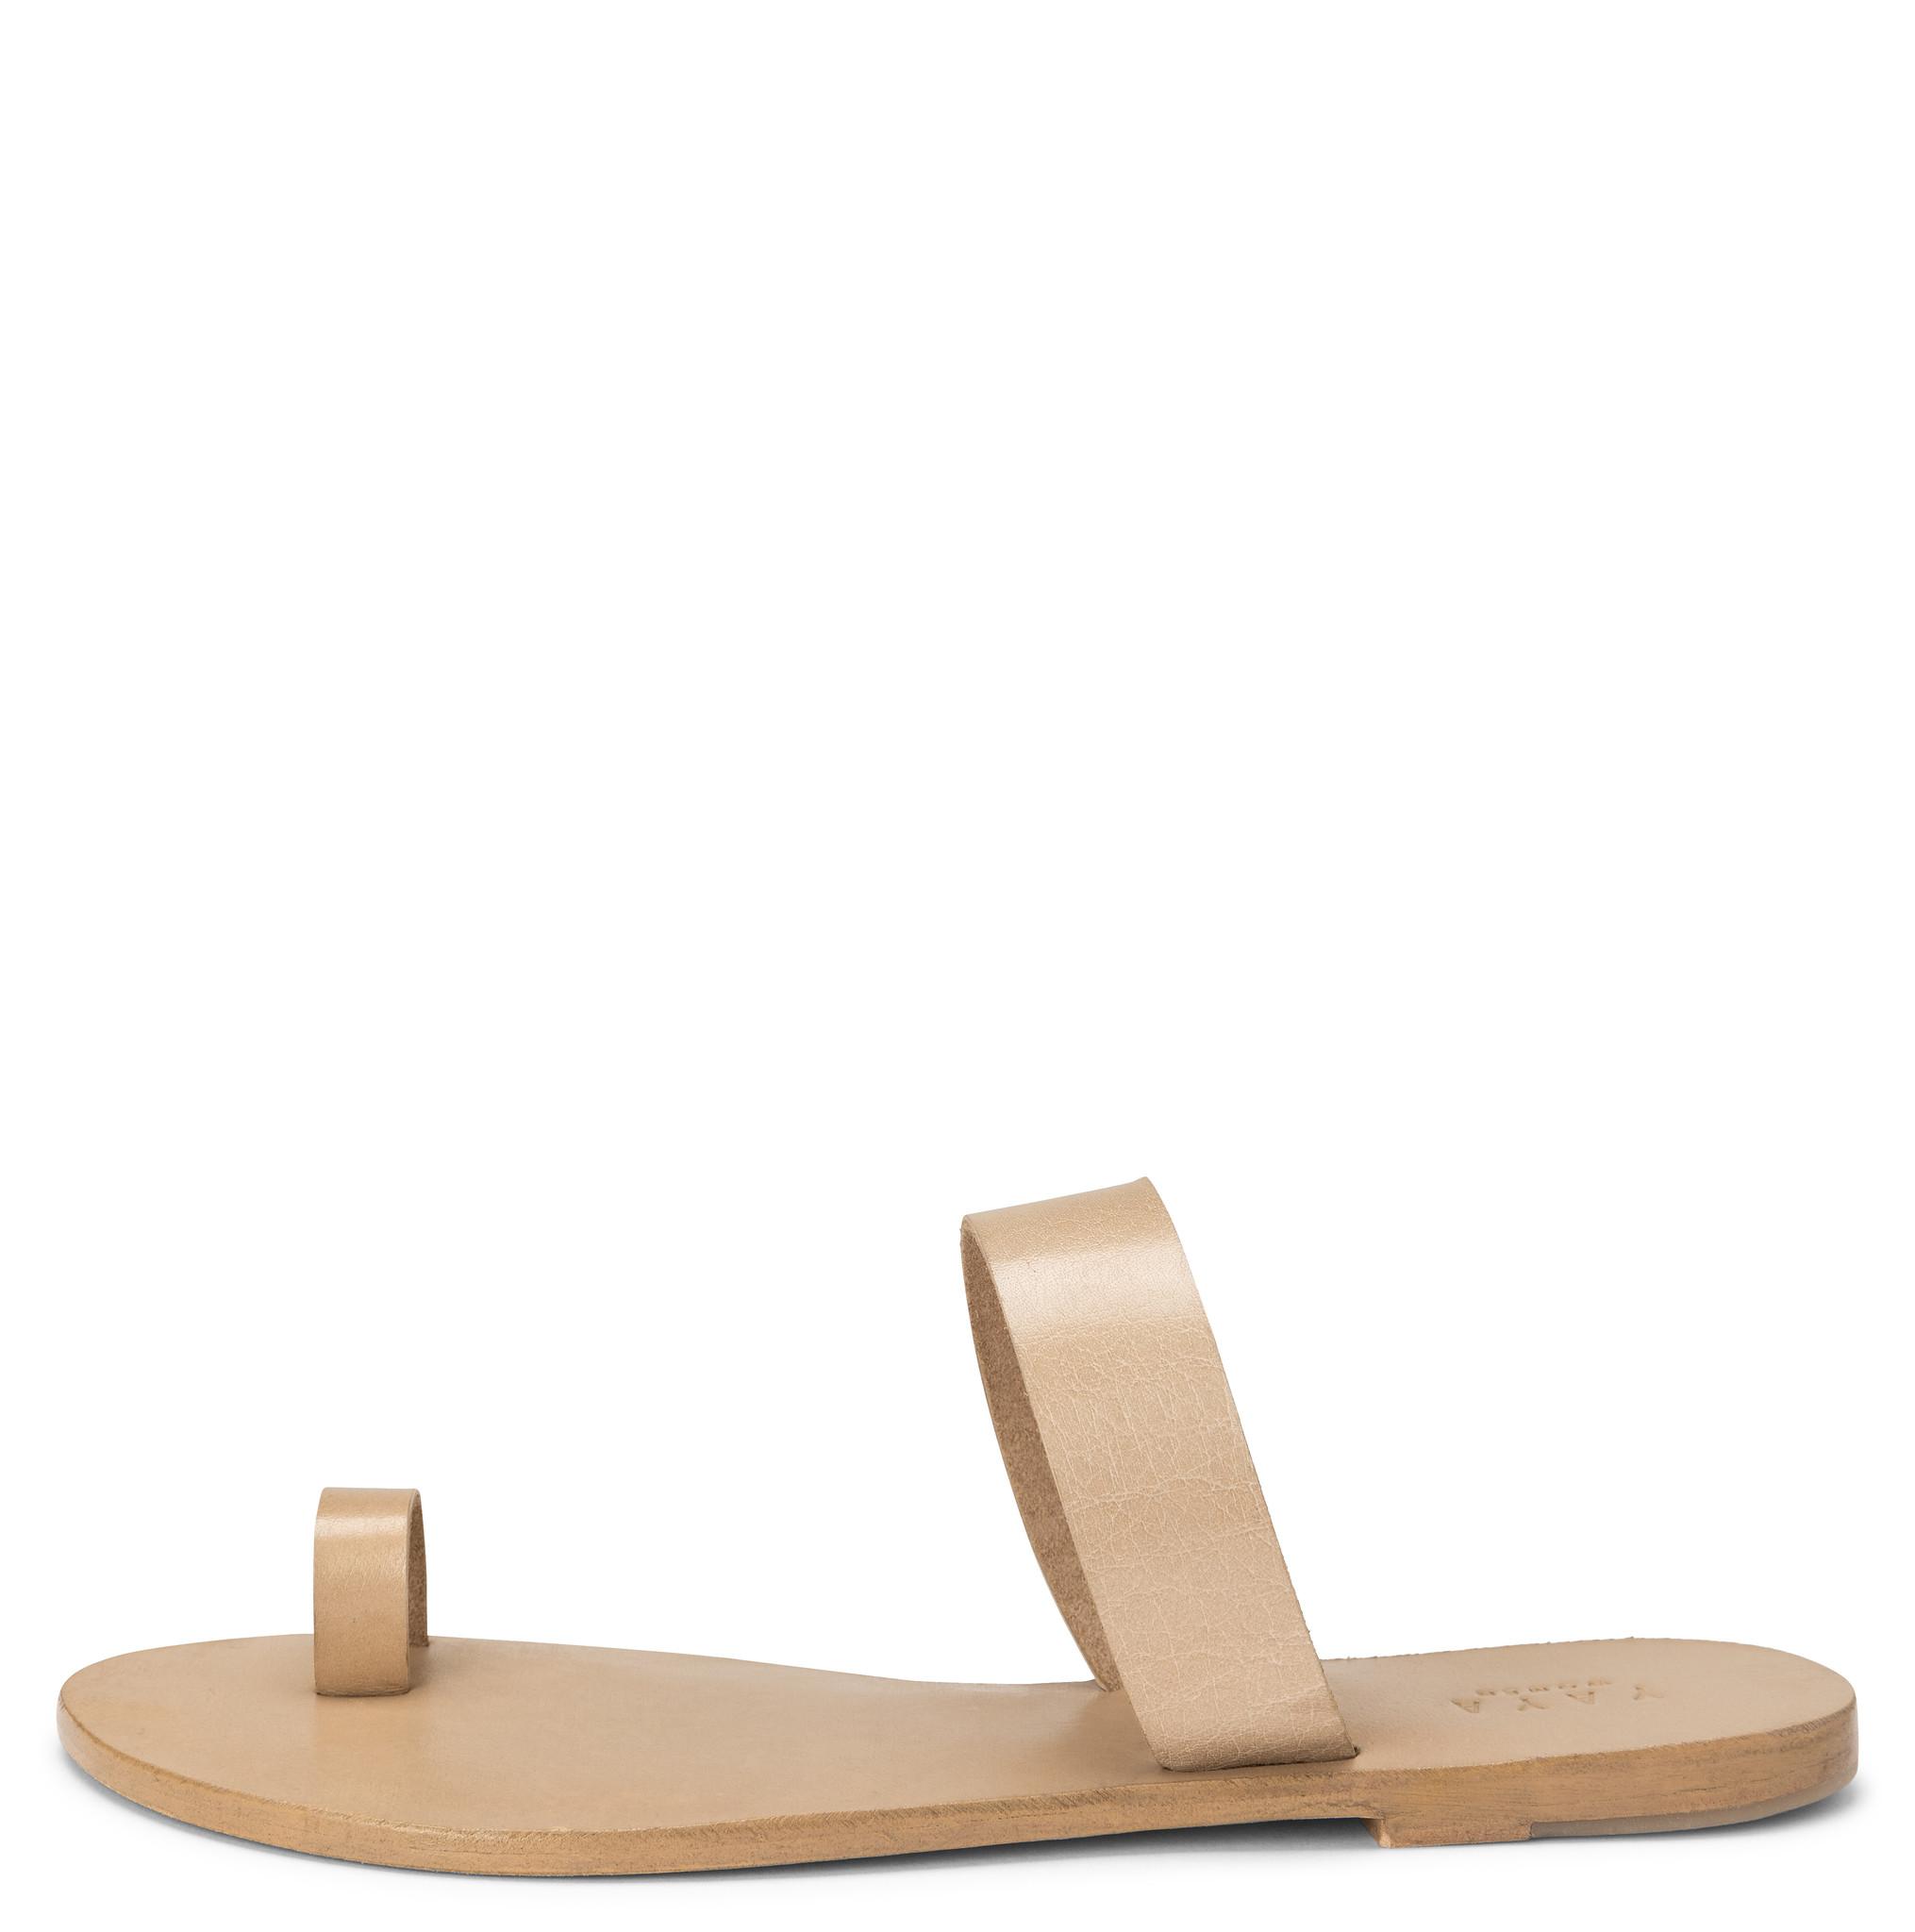 yaya Leather slipper 1343084-115-2